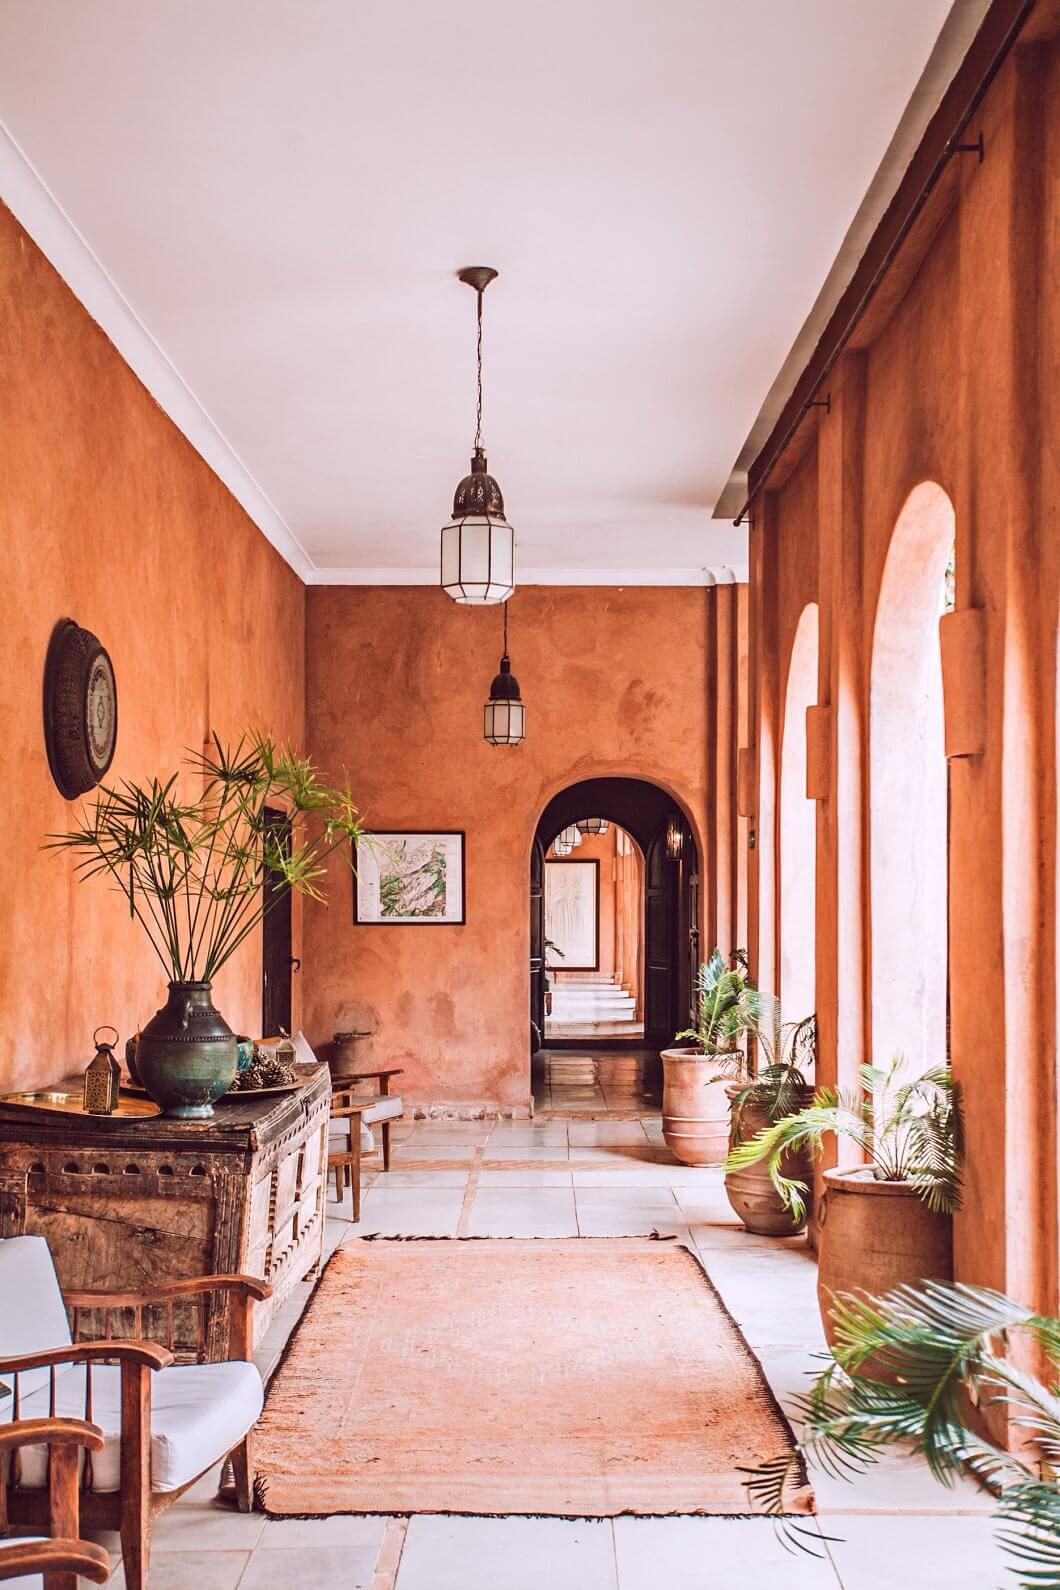 https://haushoff.com/wp-content/uploads/2018/01/Hotel-Kasbah-Bab-Ourika-1-1060x1590.jpg